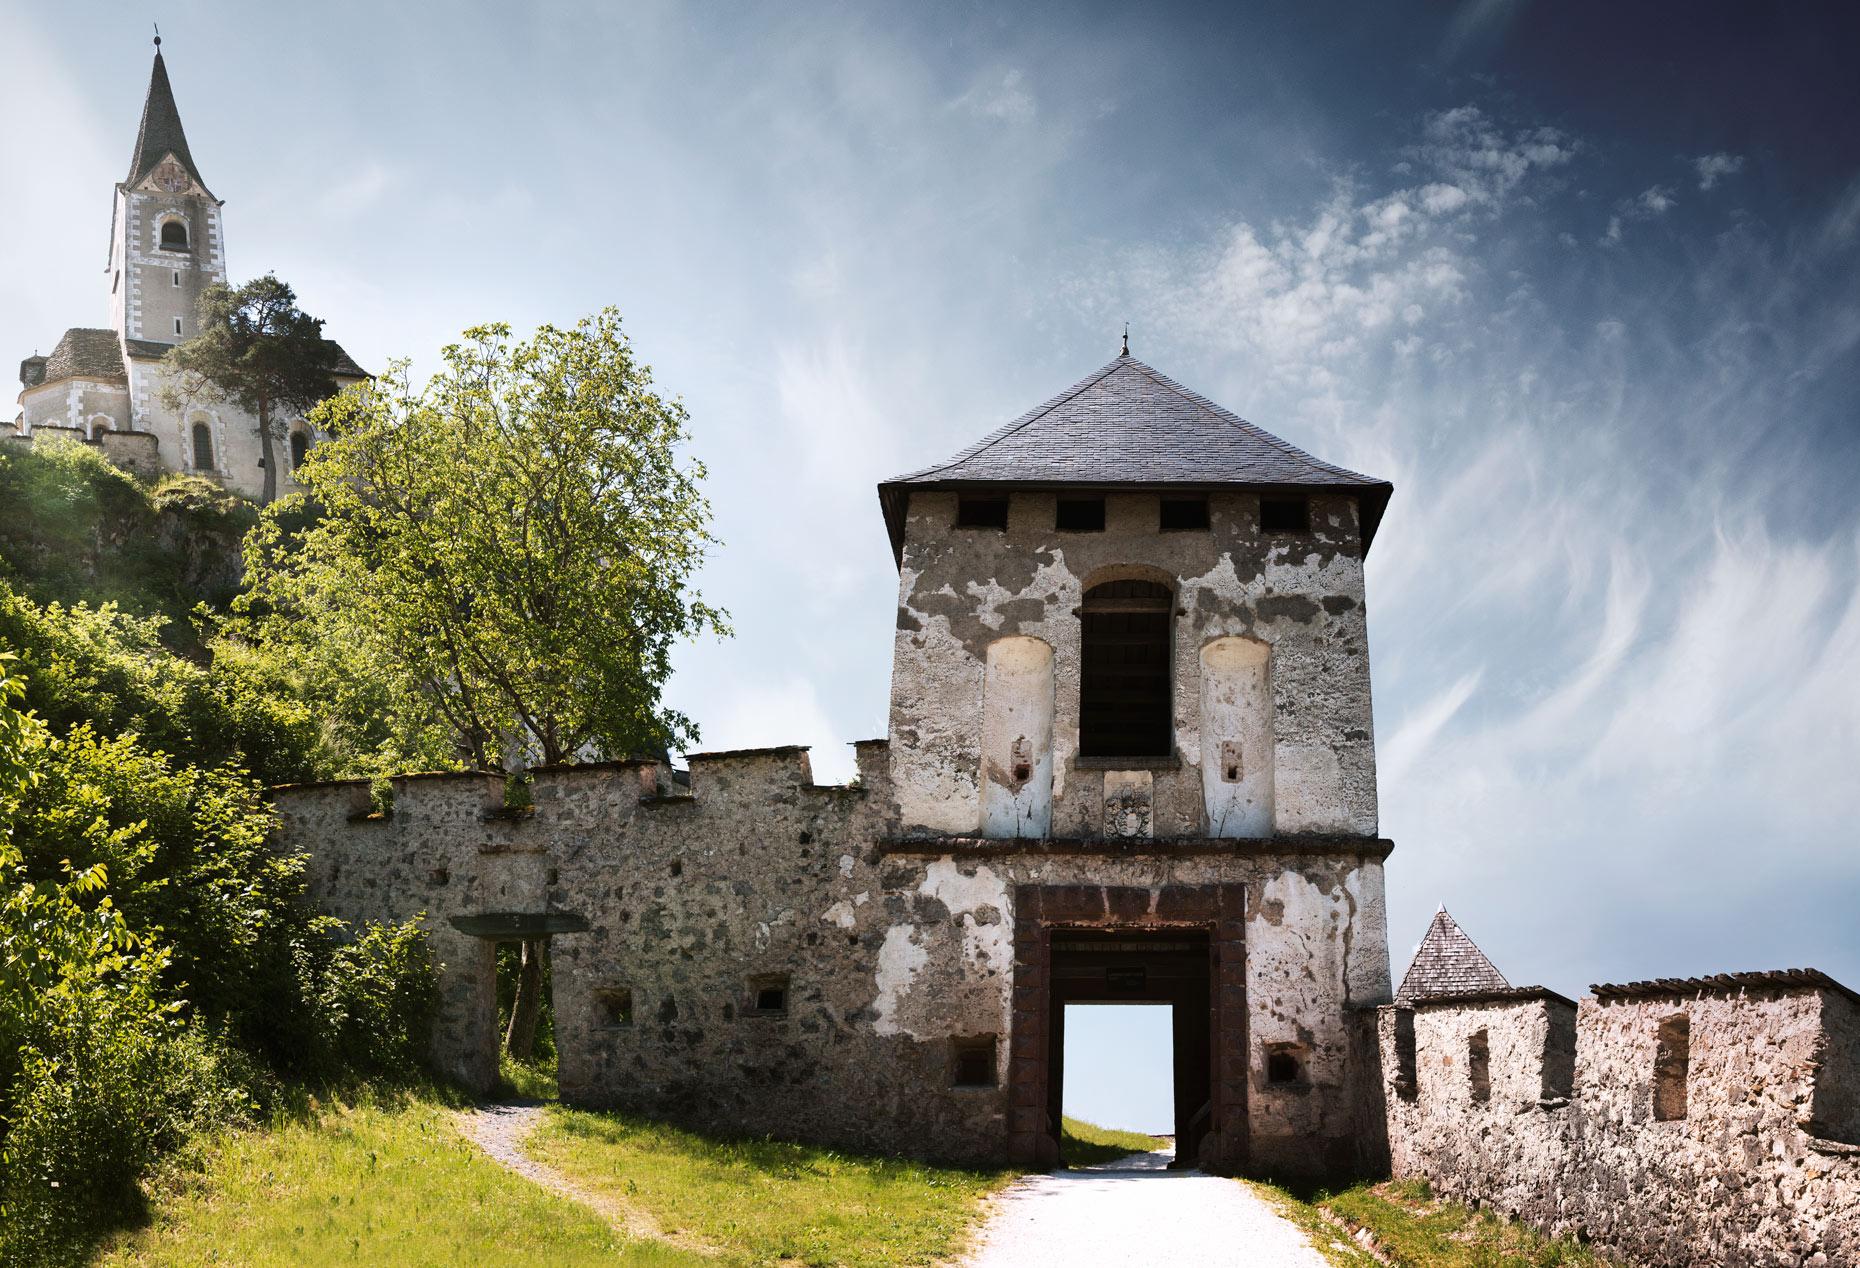 Travel Photography Derek Israelsen 022 Castle Wall